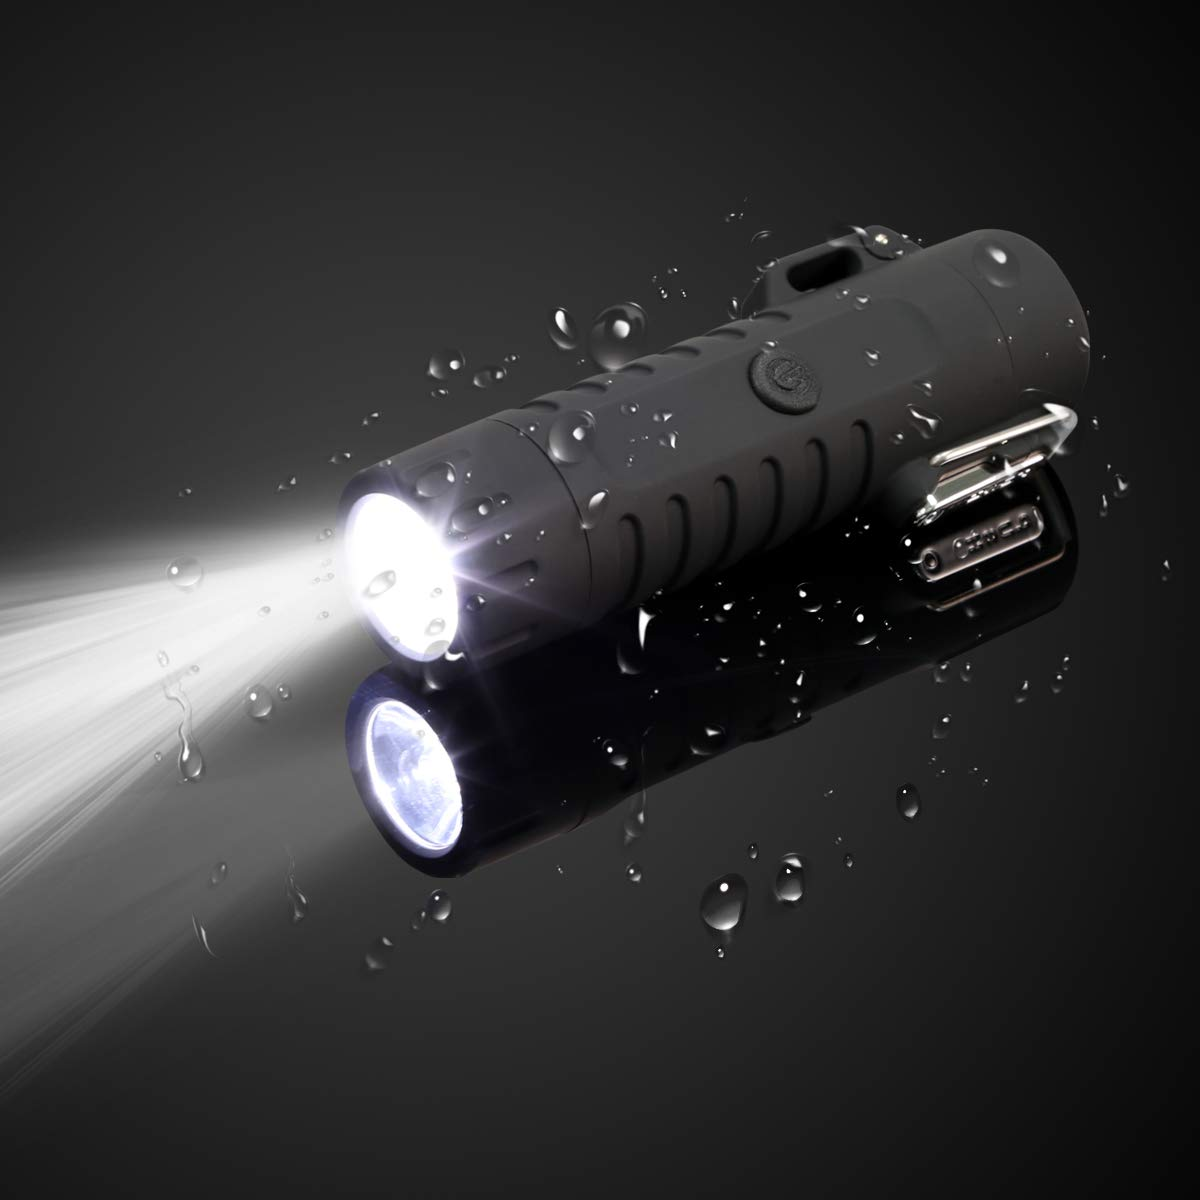 USB Encendedor Recargable con Linterna Impermeable sin Llama Plasma Encendedor para Acampada Cocina Cigarrillos Velas Qimaoo Mechero El/éctrico Encendedor Electrico Doble Arco